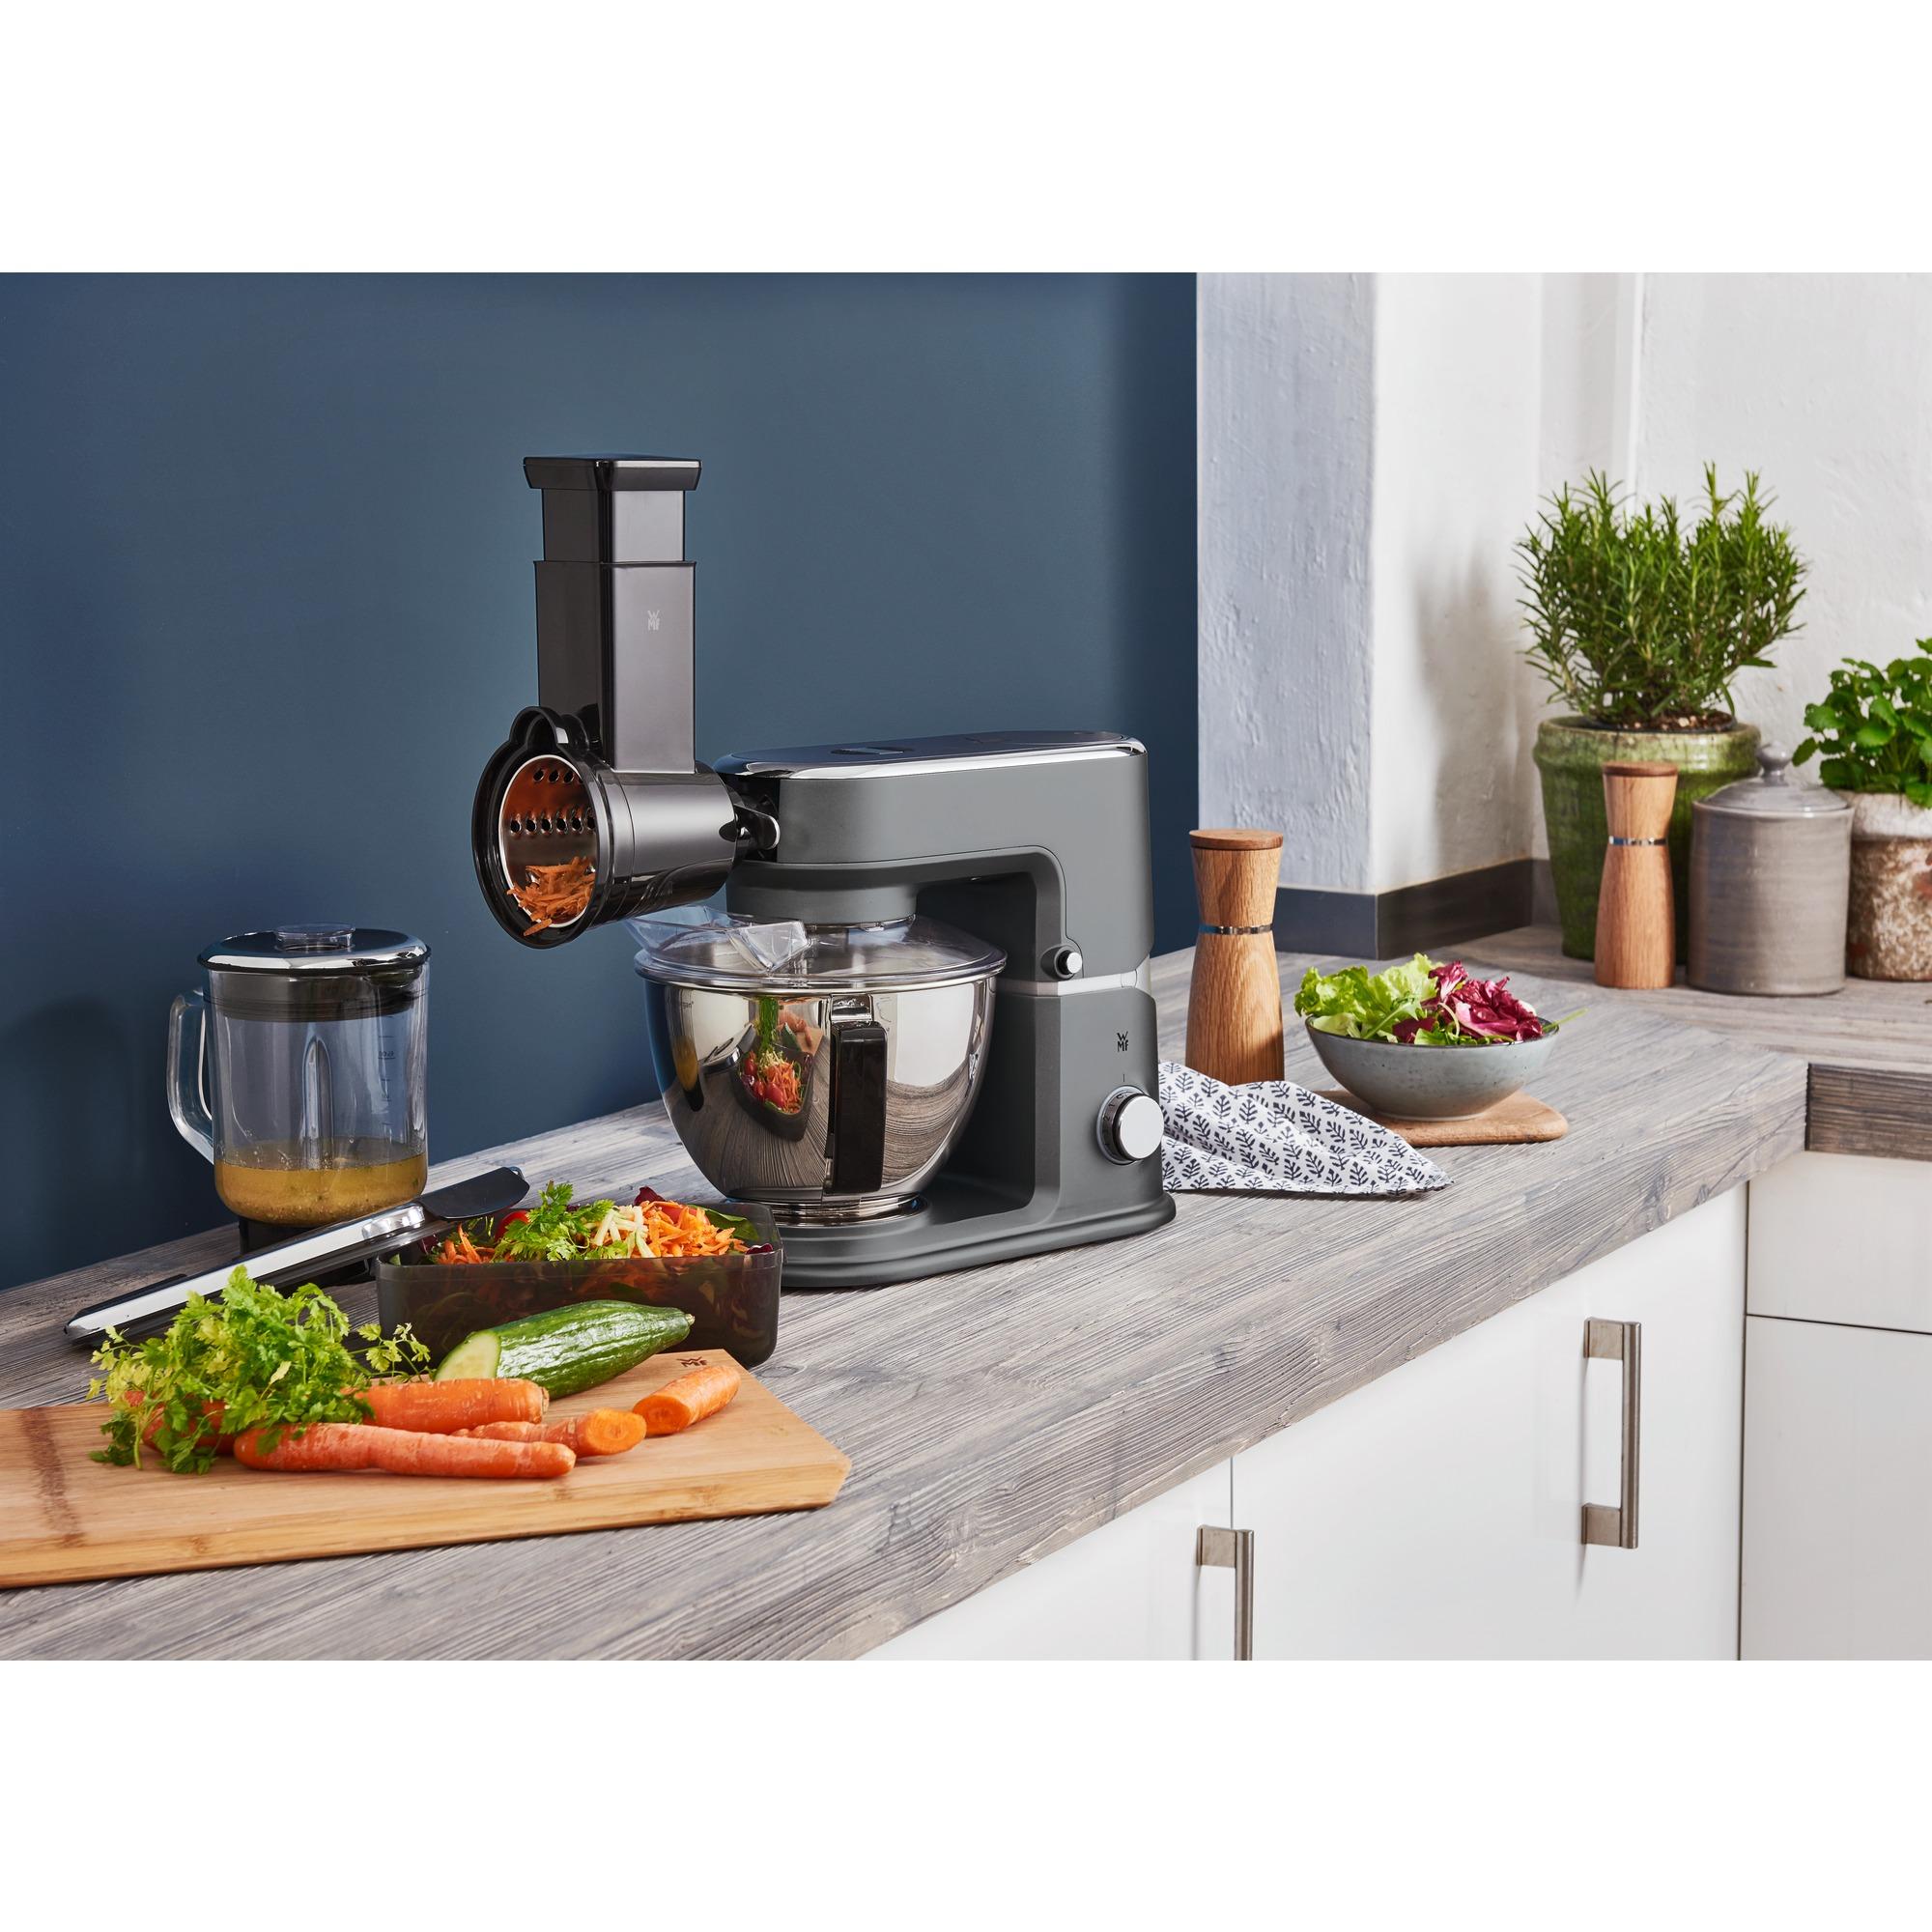 wmf keukenmachine